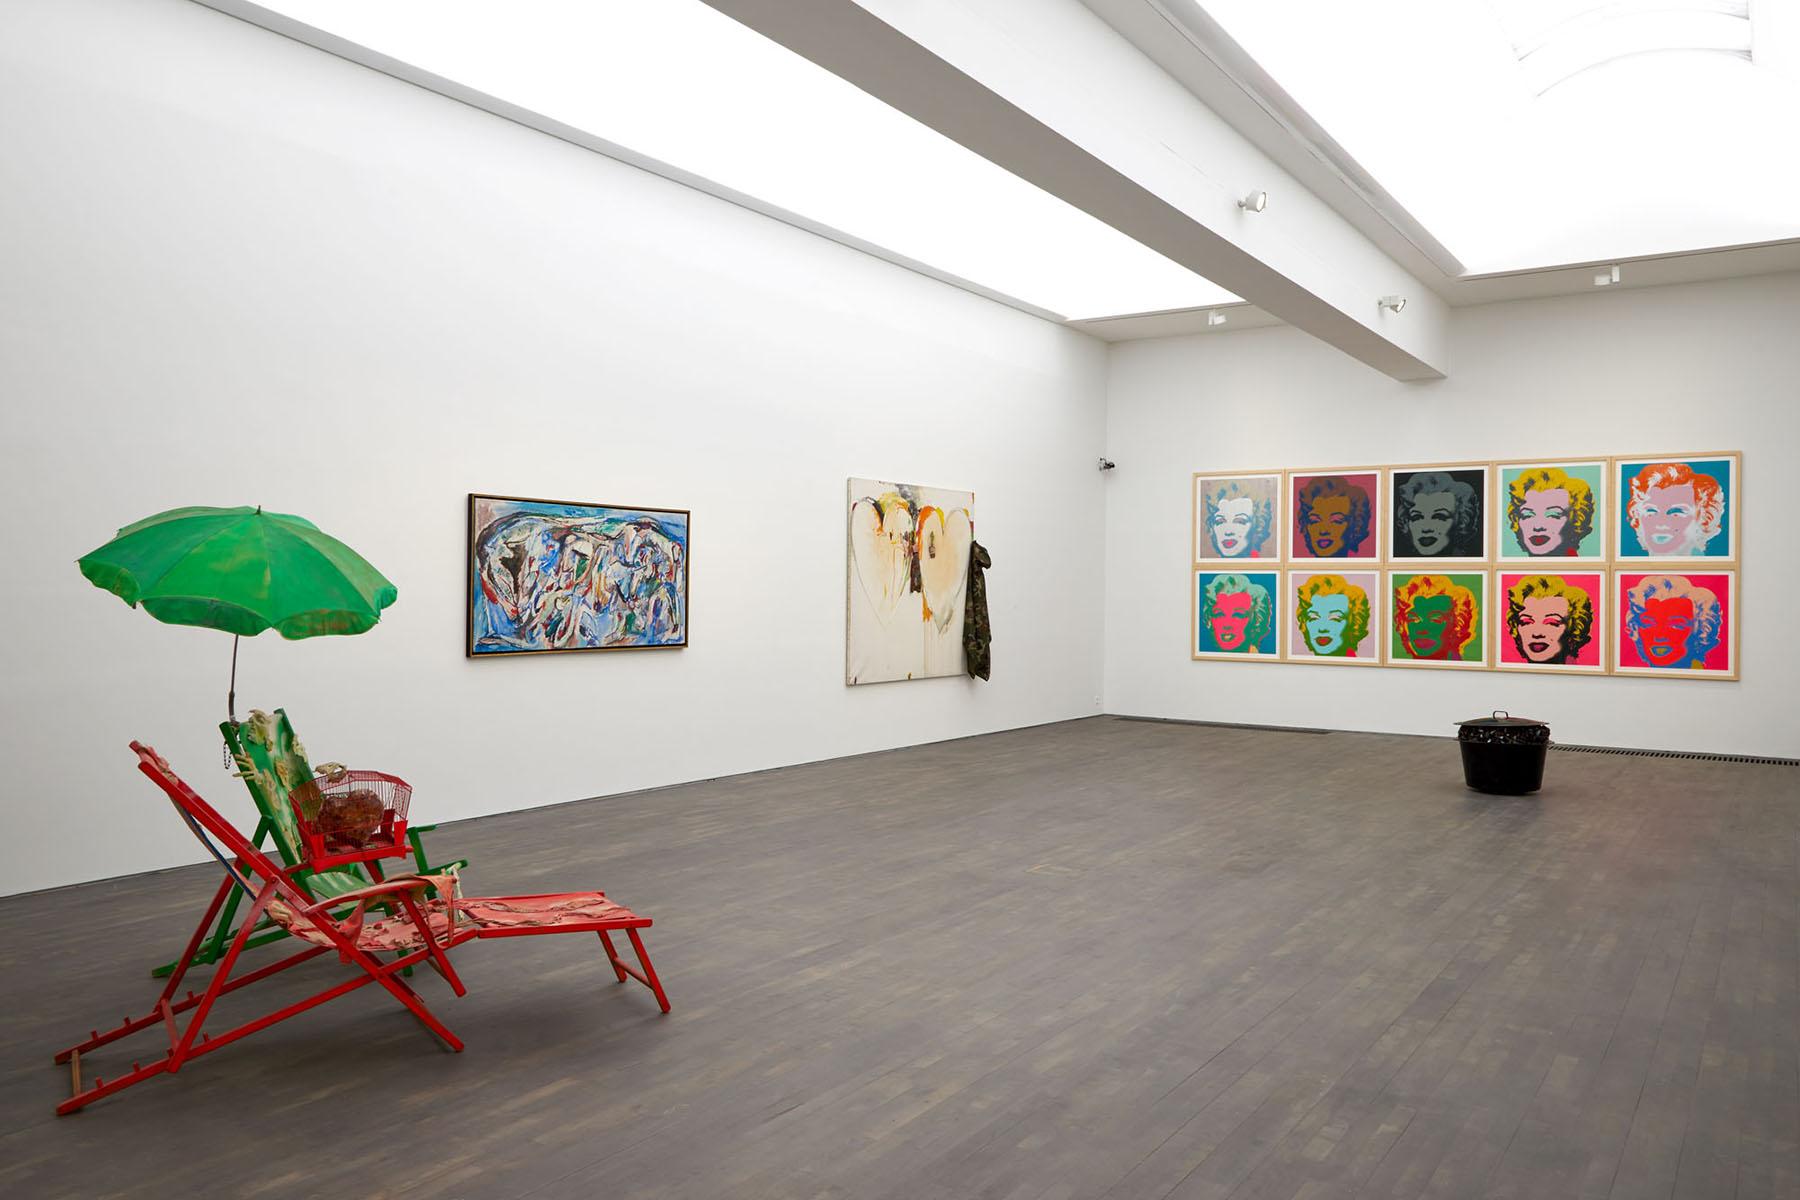 The Municipal Museum of Contemporary Art (S.M.A.K), Ghent